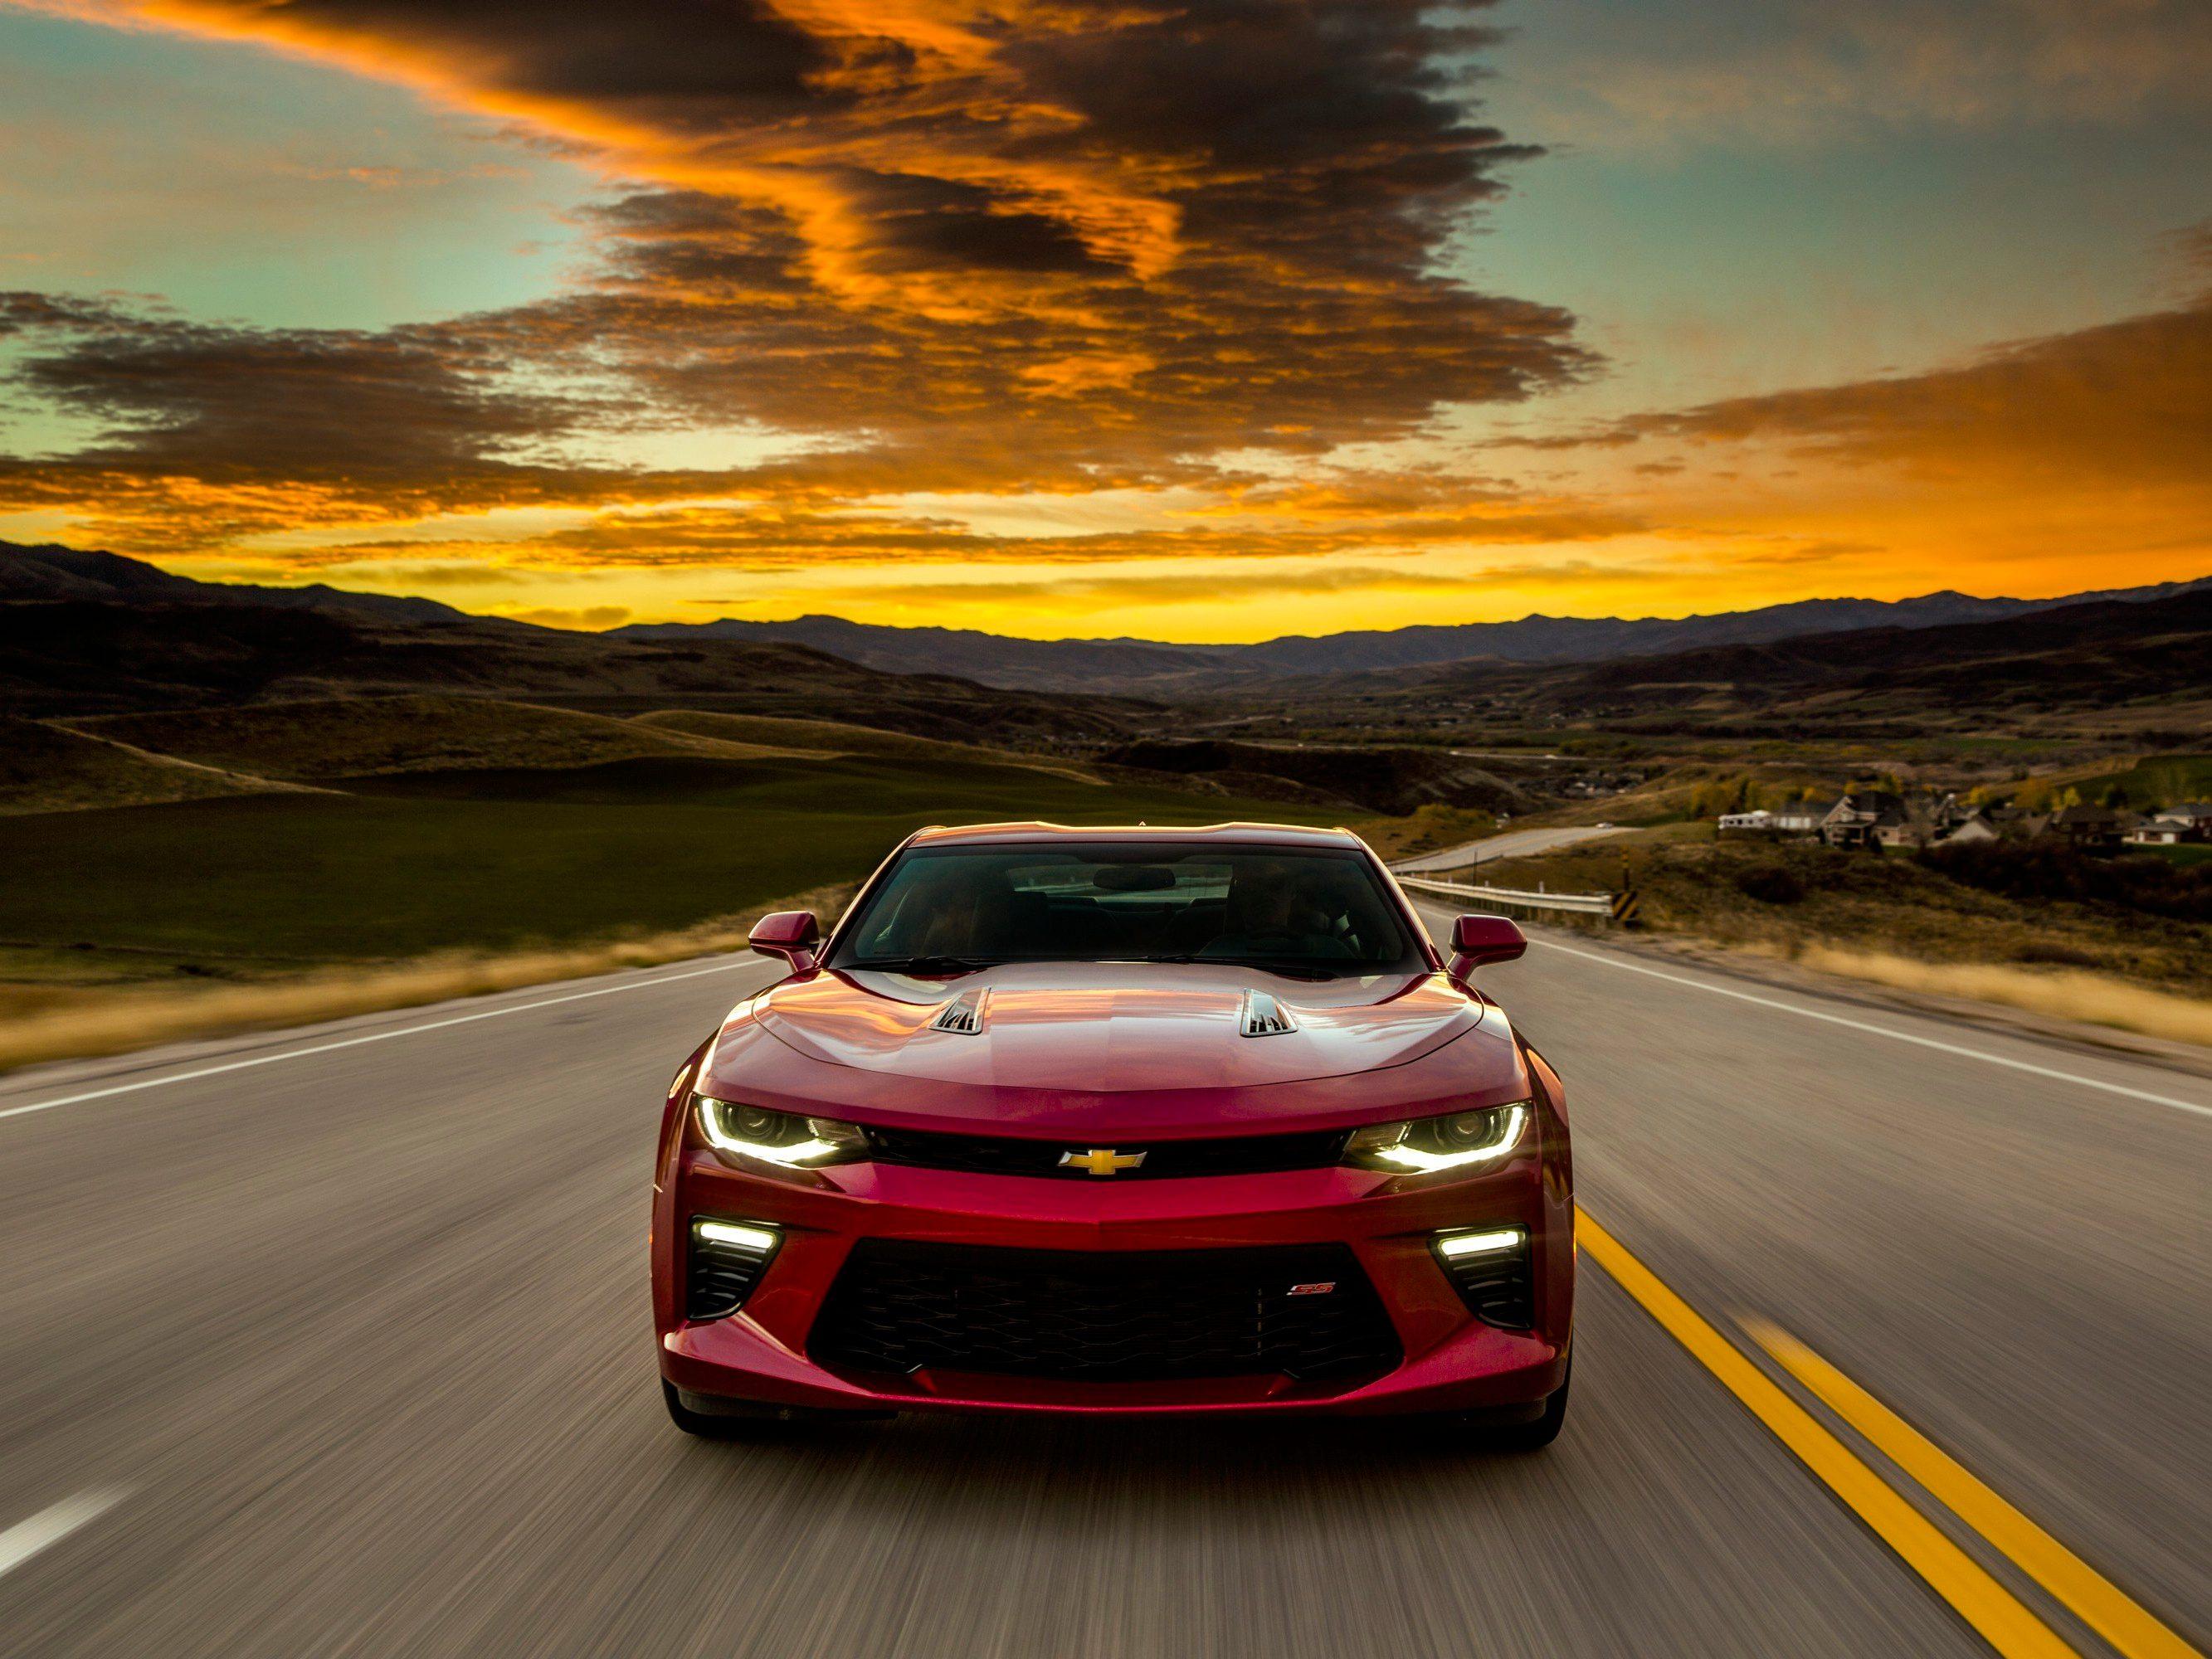 Introducing the 2016 Chevrolet Camaro